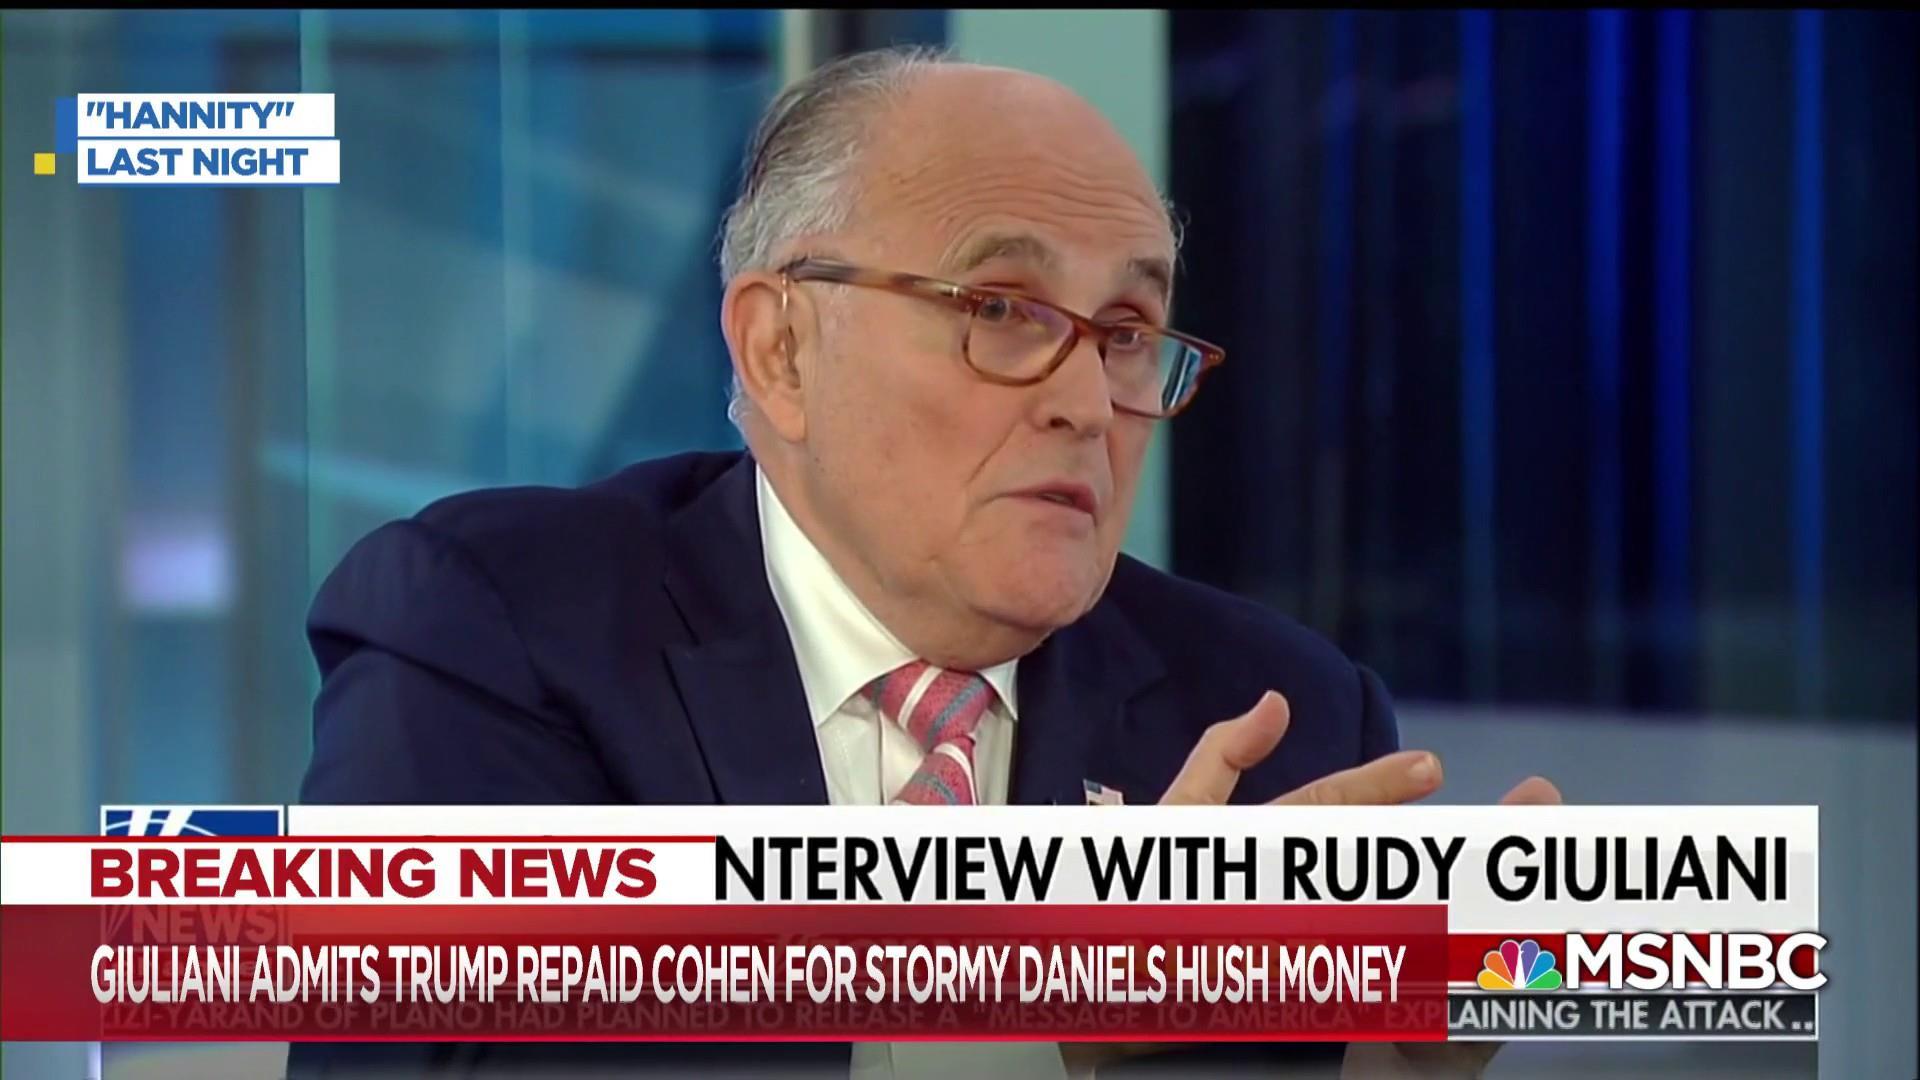 Watchdog: Giuliani gave us 'strong evidence' of violation